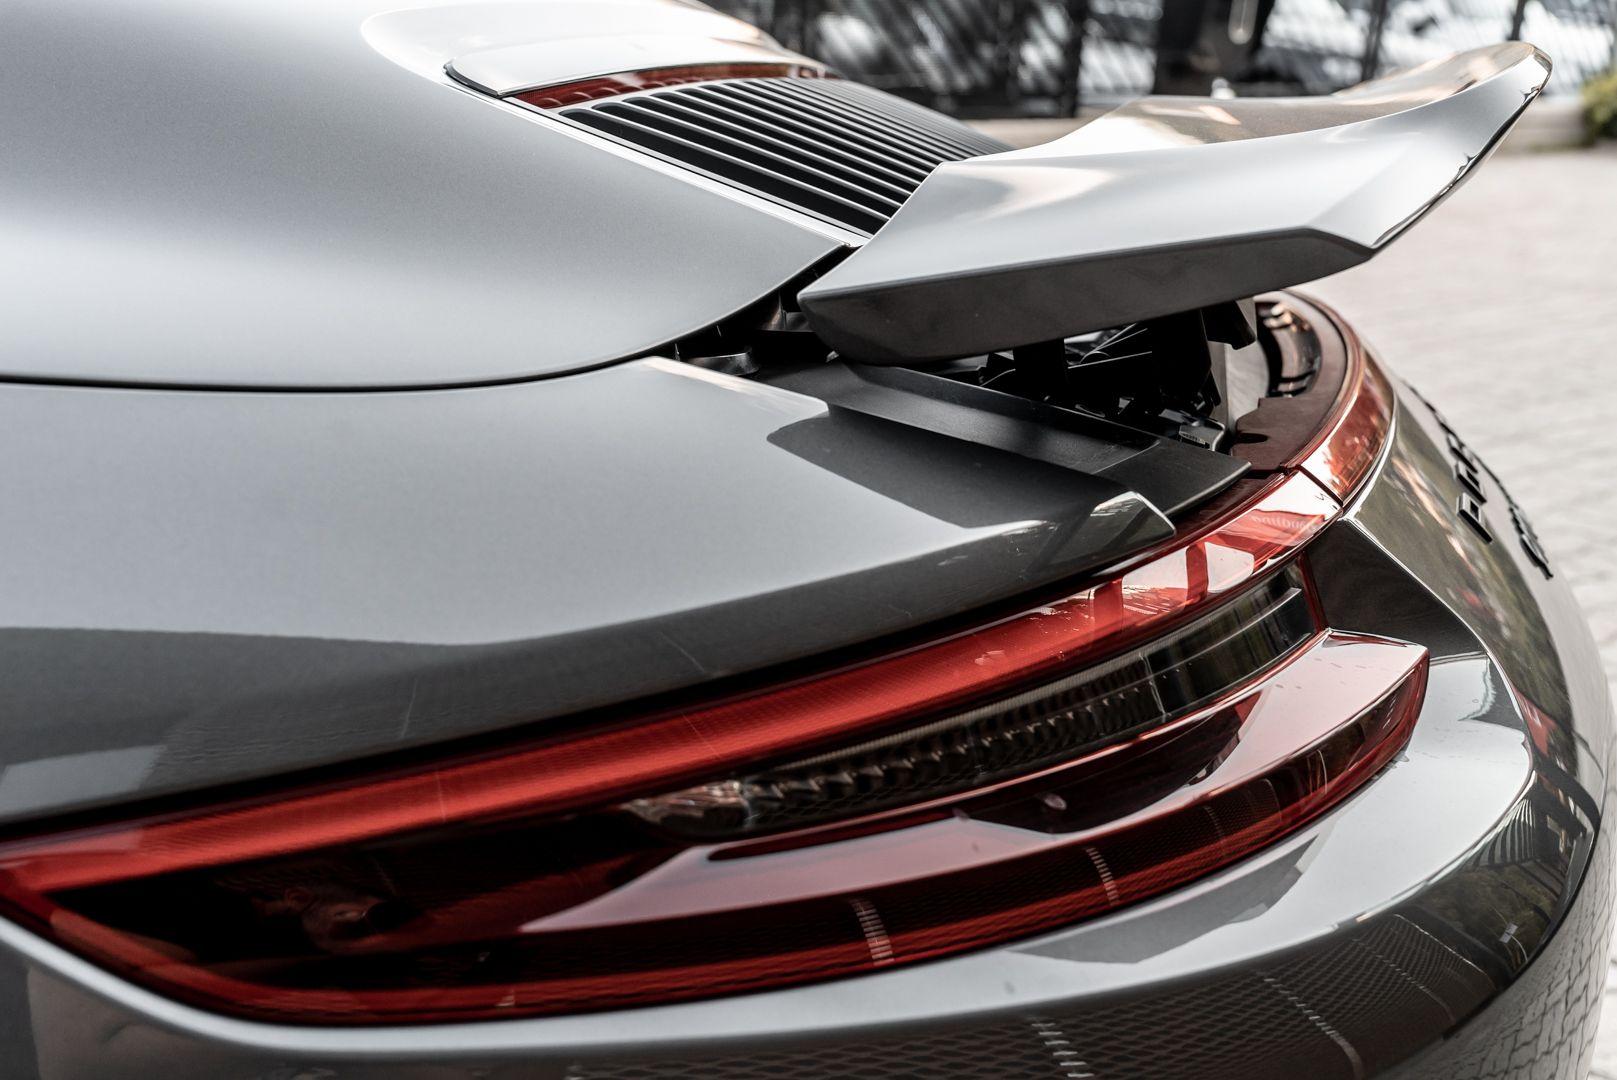 2018 Porsche 911 Targa 4 GTS 85292